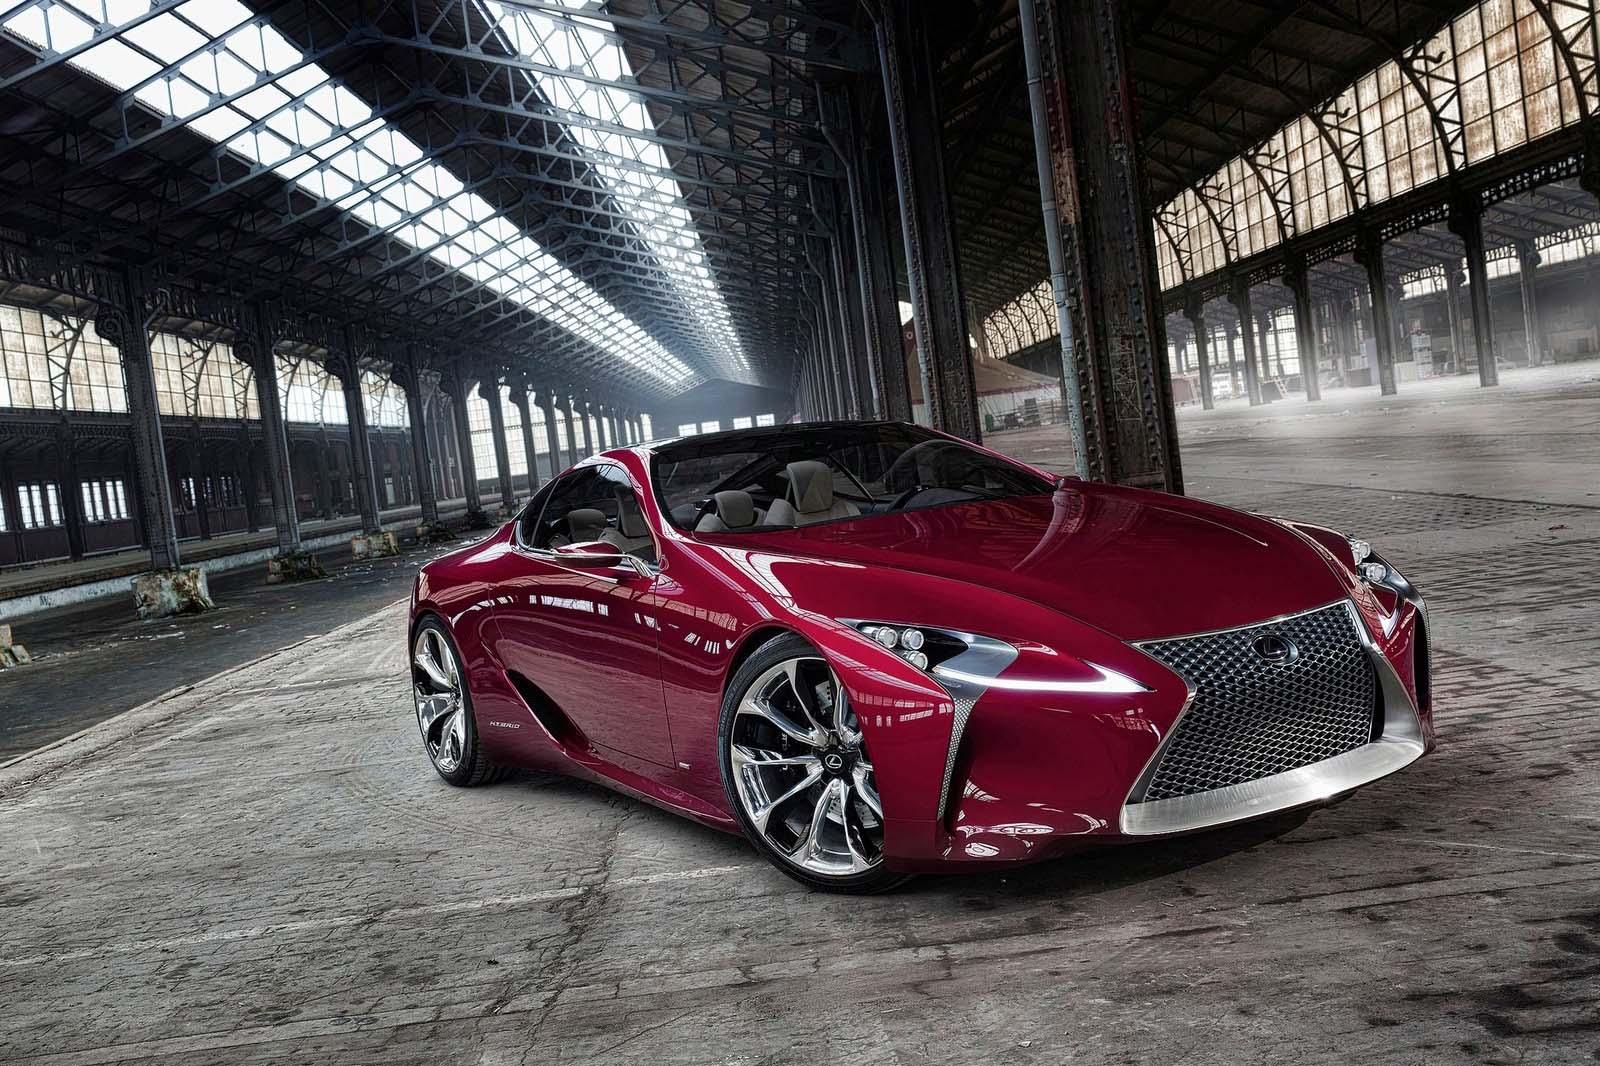 http://www.autos.ca/wp-content/uploads/2016/01/04B-2012-Lexus-LF-LC-Concept-1.jpg